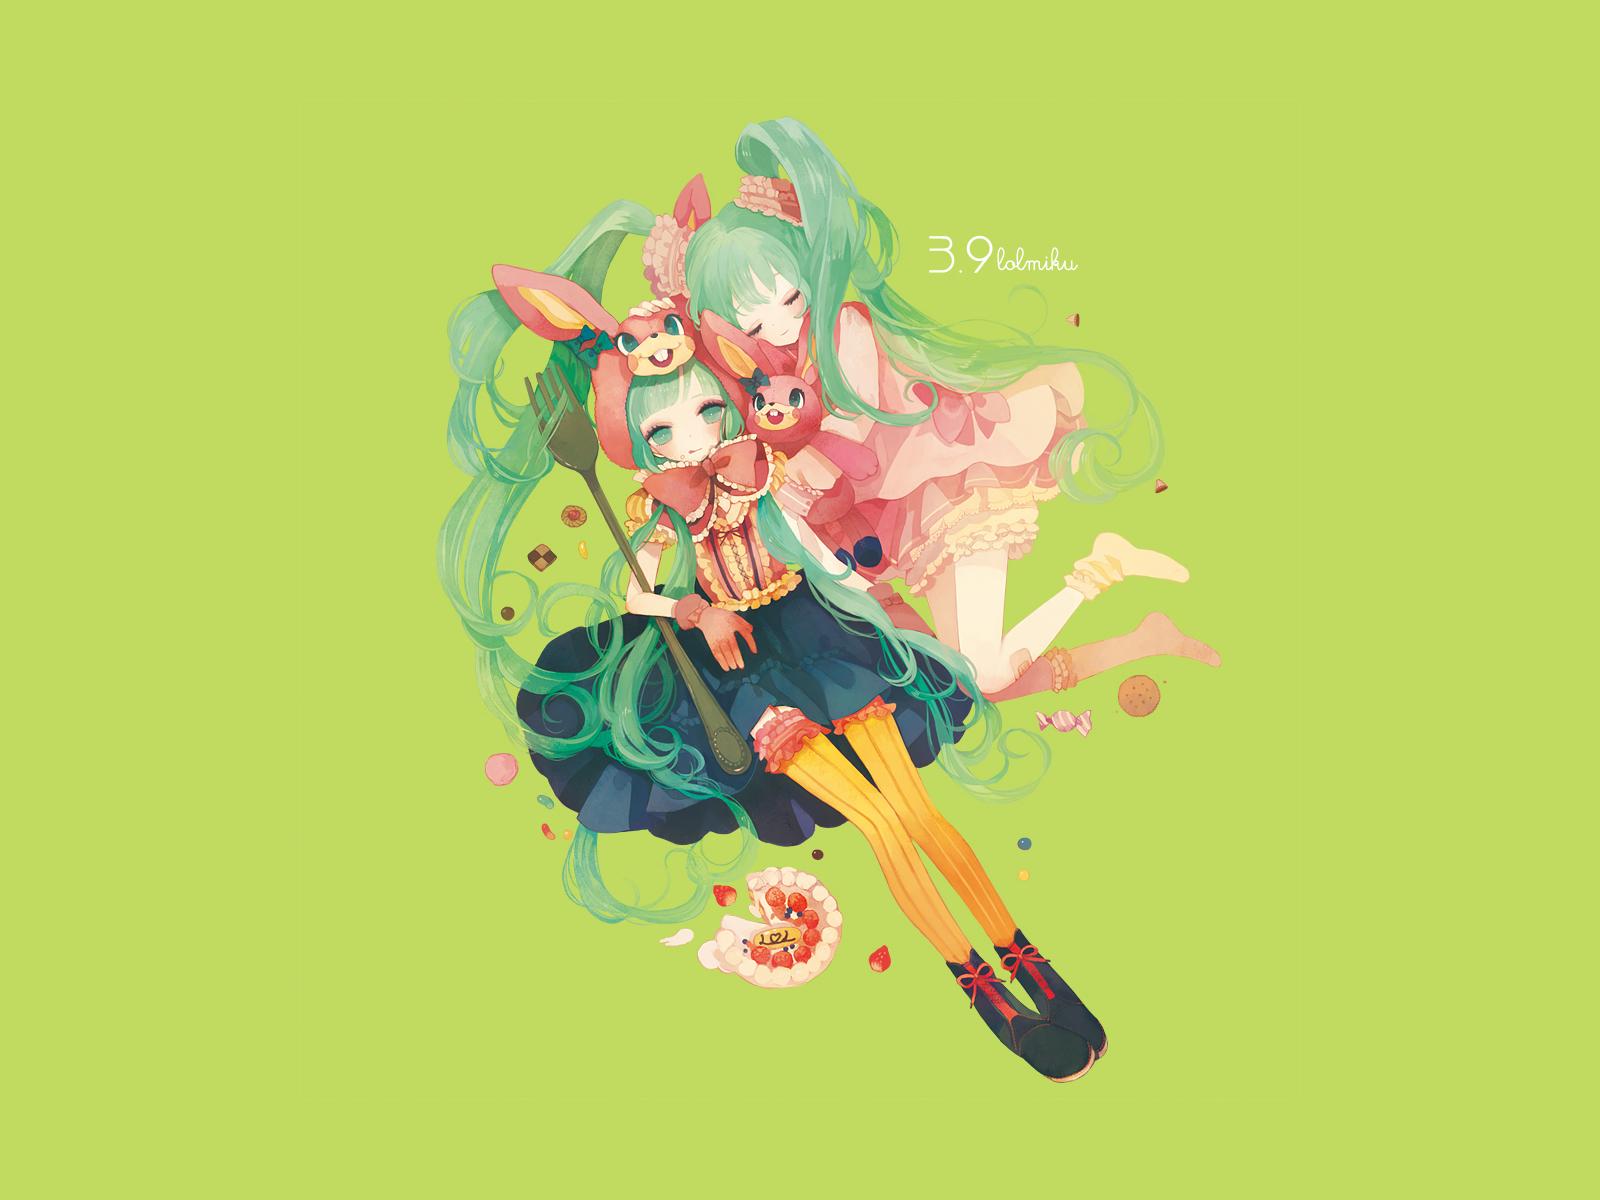 aqua_eyes aqua_hair dress food green hatsune_miku long_hair lots_of_laugh_(vocaloid) socks stockings twintails vocaloid